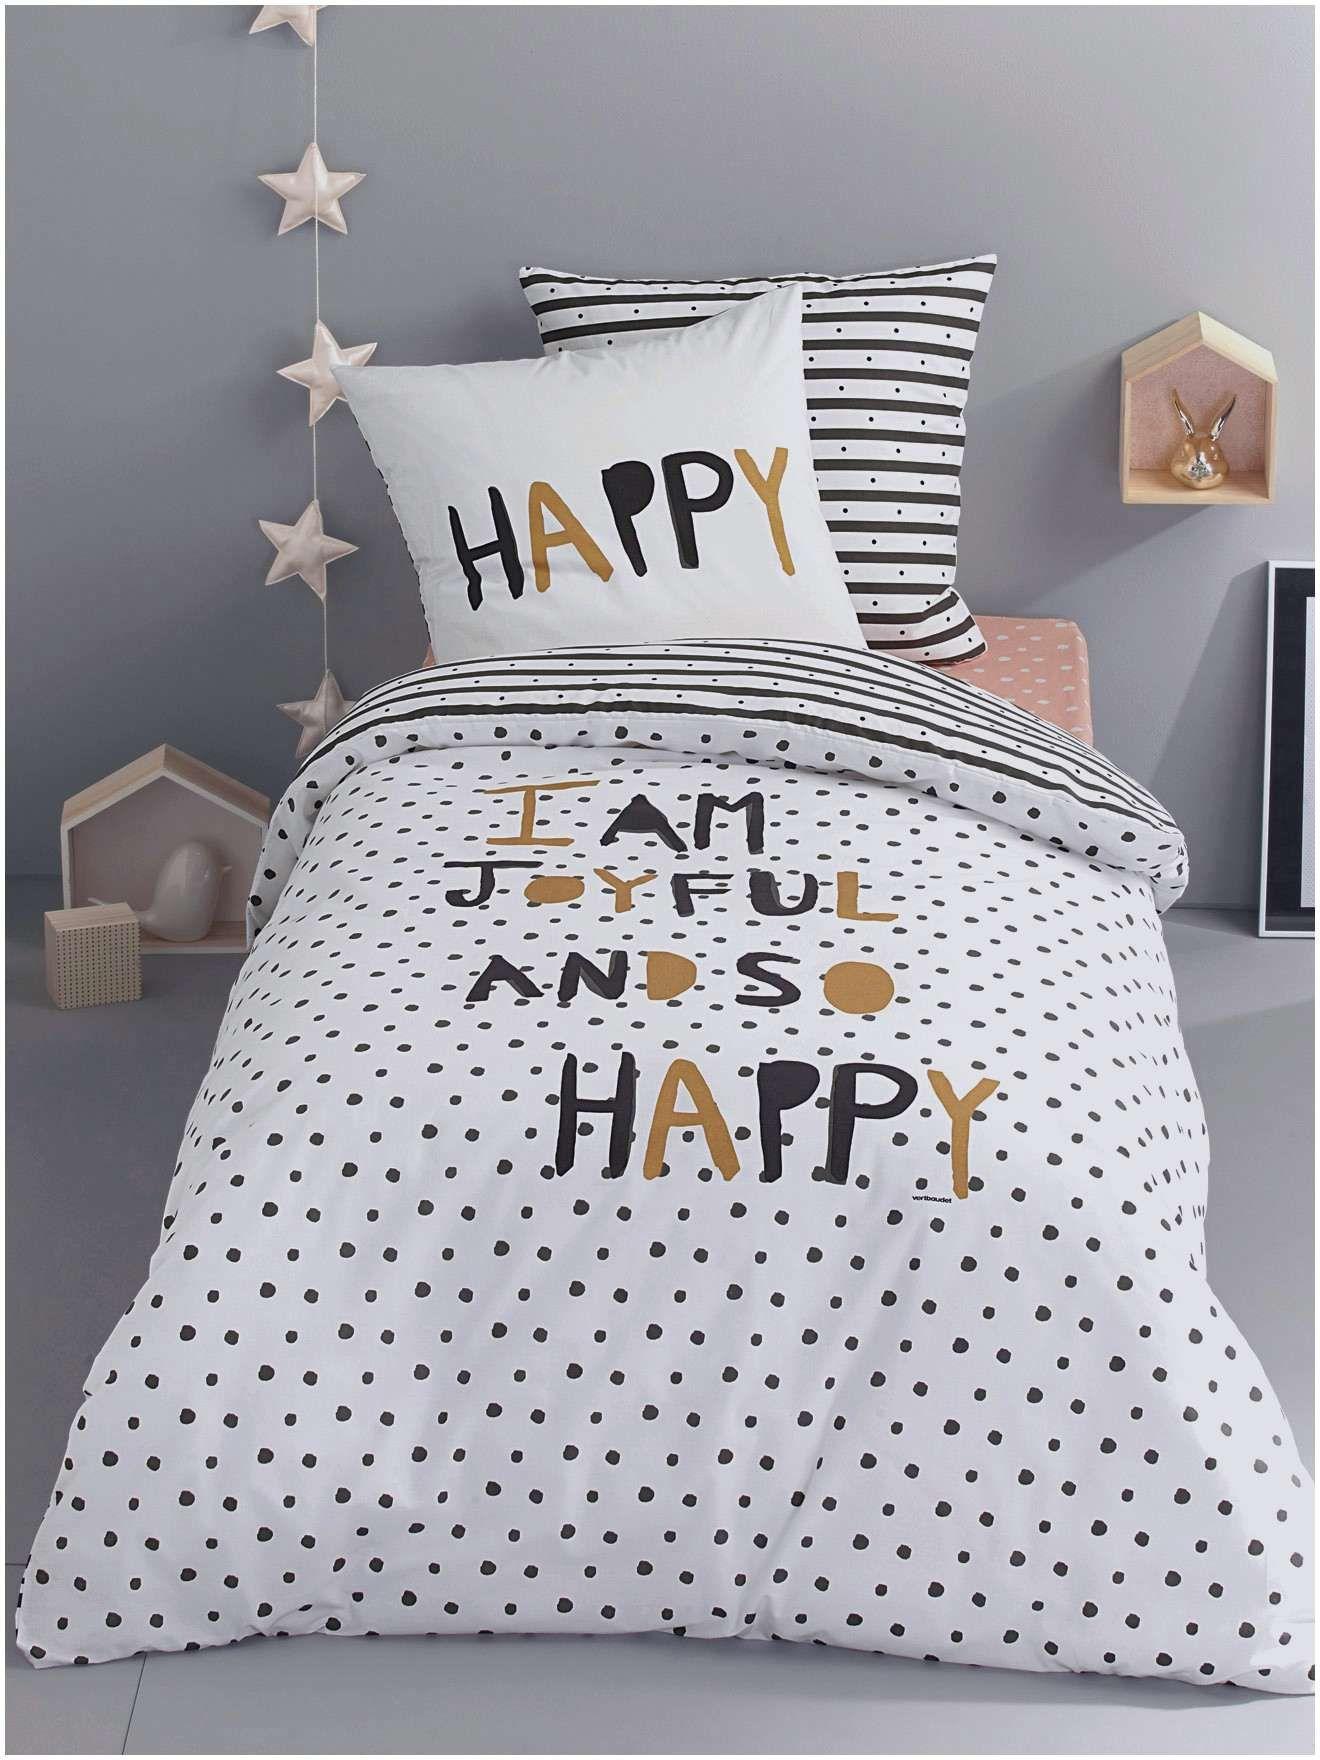 Taille Couette Lit 140 Taille Couette Lit 140 Lit Grande Taille Achat Vente Pas Cher Cdiscount Diman Kids Bedroom Inspiration White Duvet Covers Duvet Covers